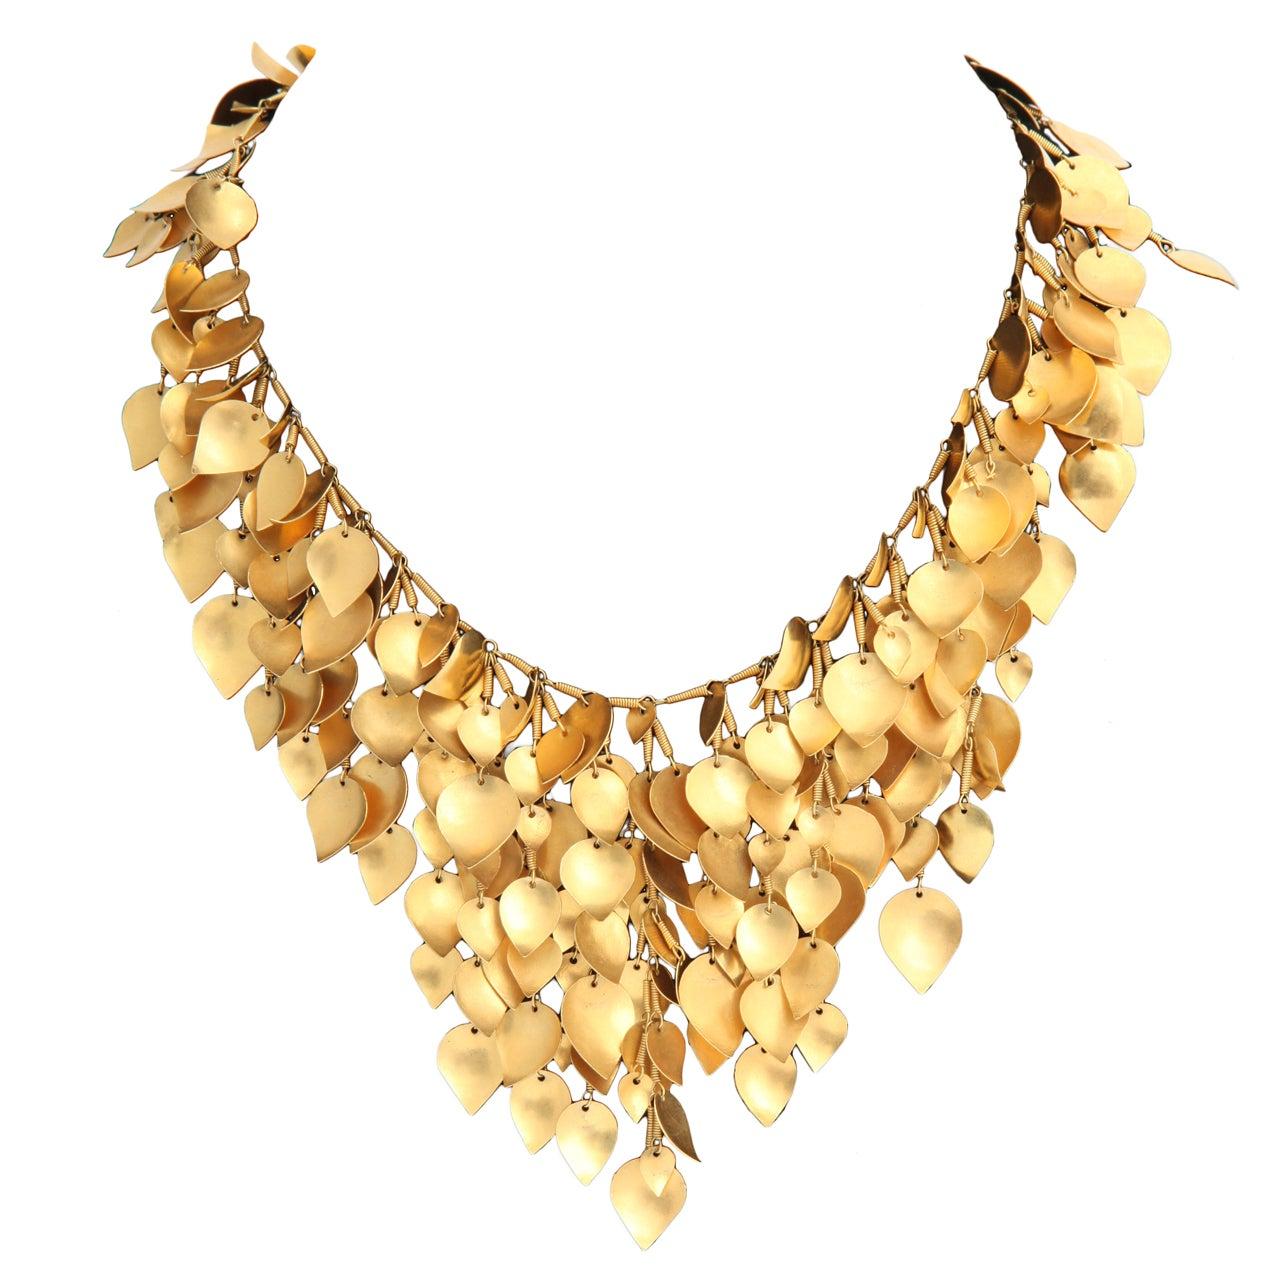 Gold Leaf Wreath Necklace At 1stdibs